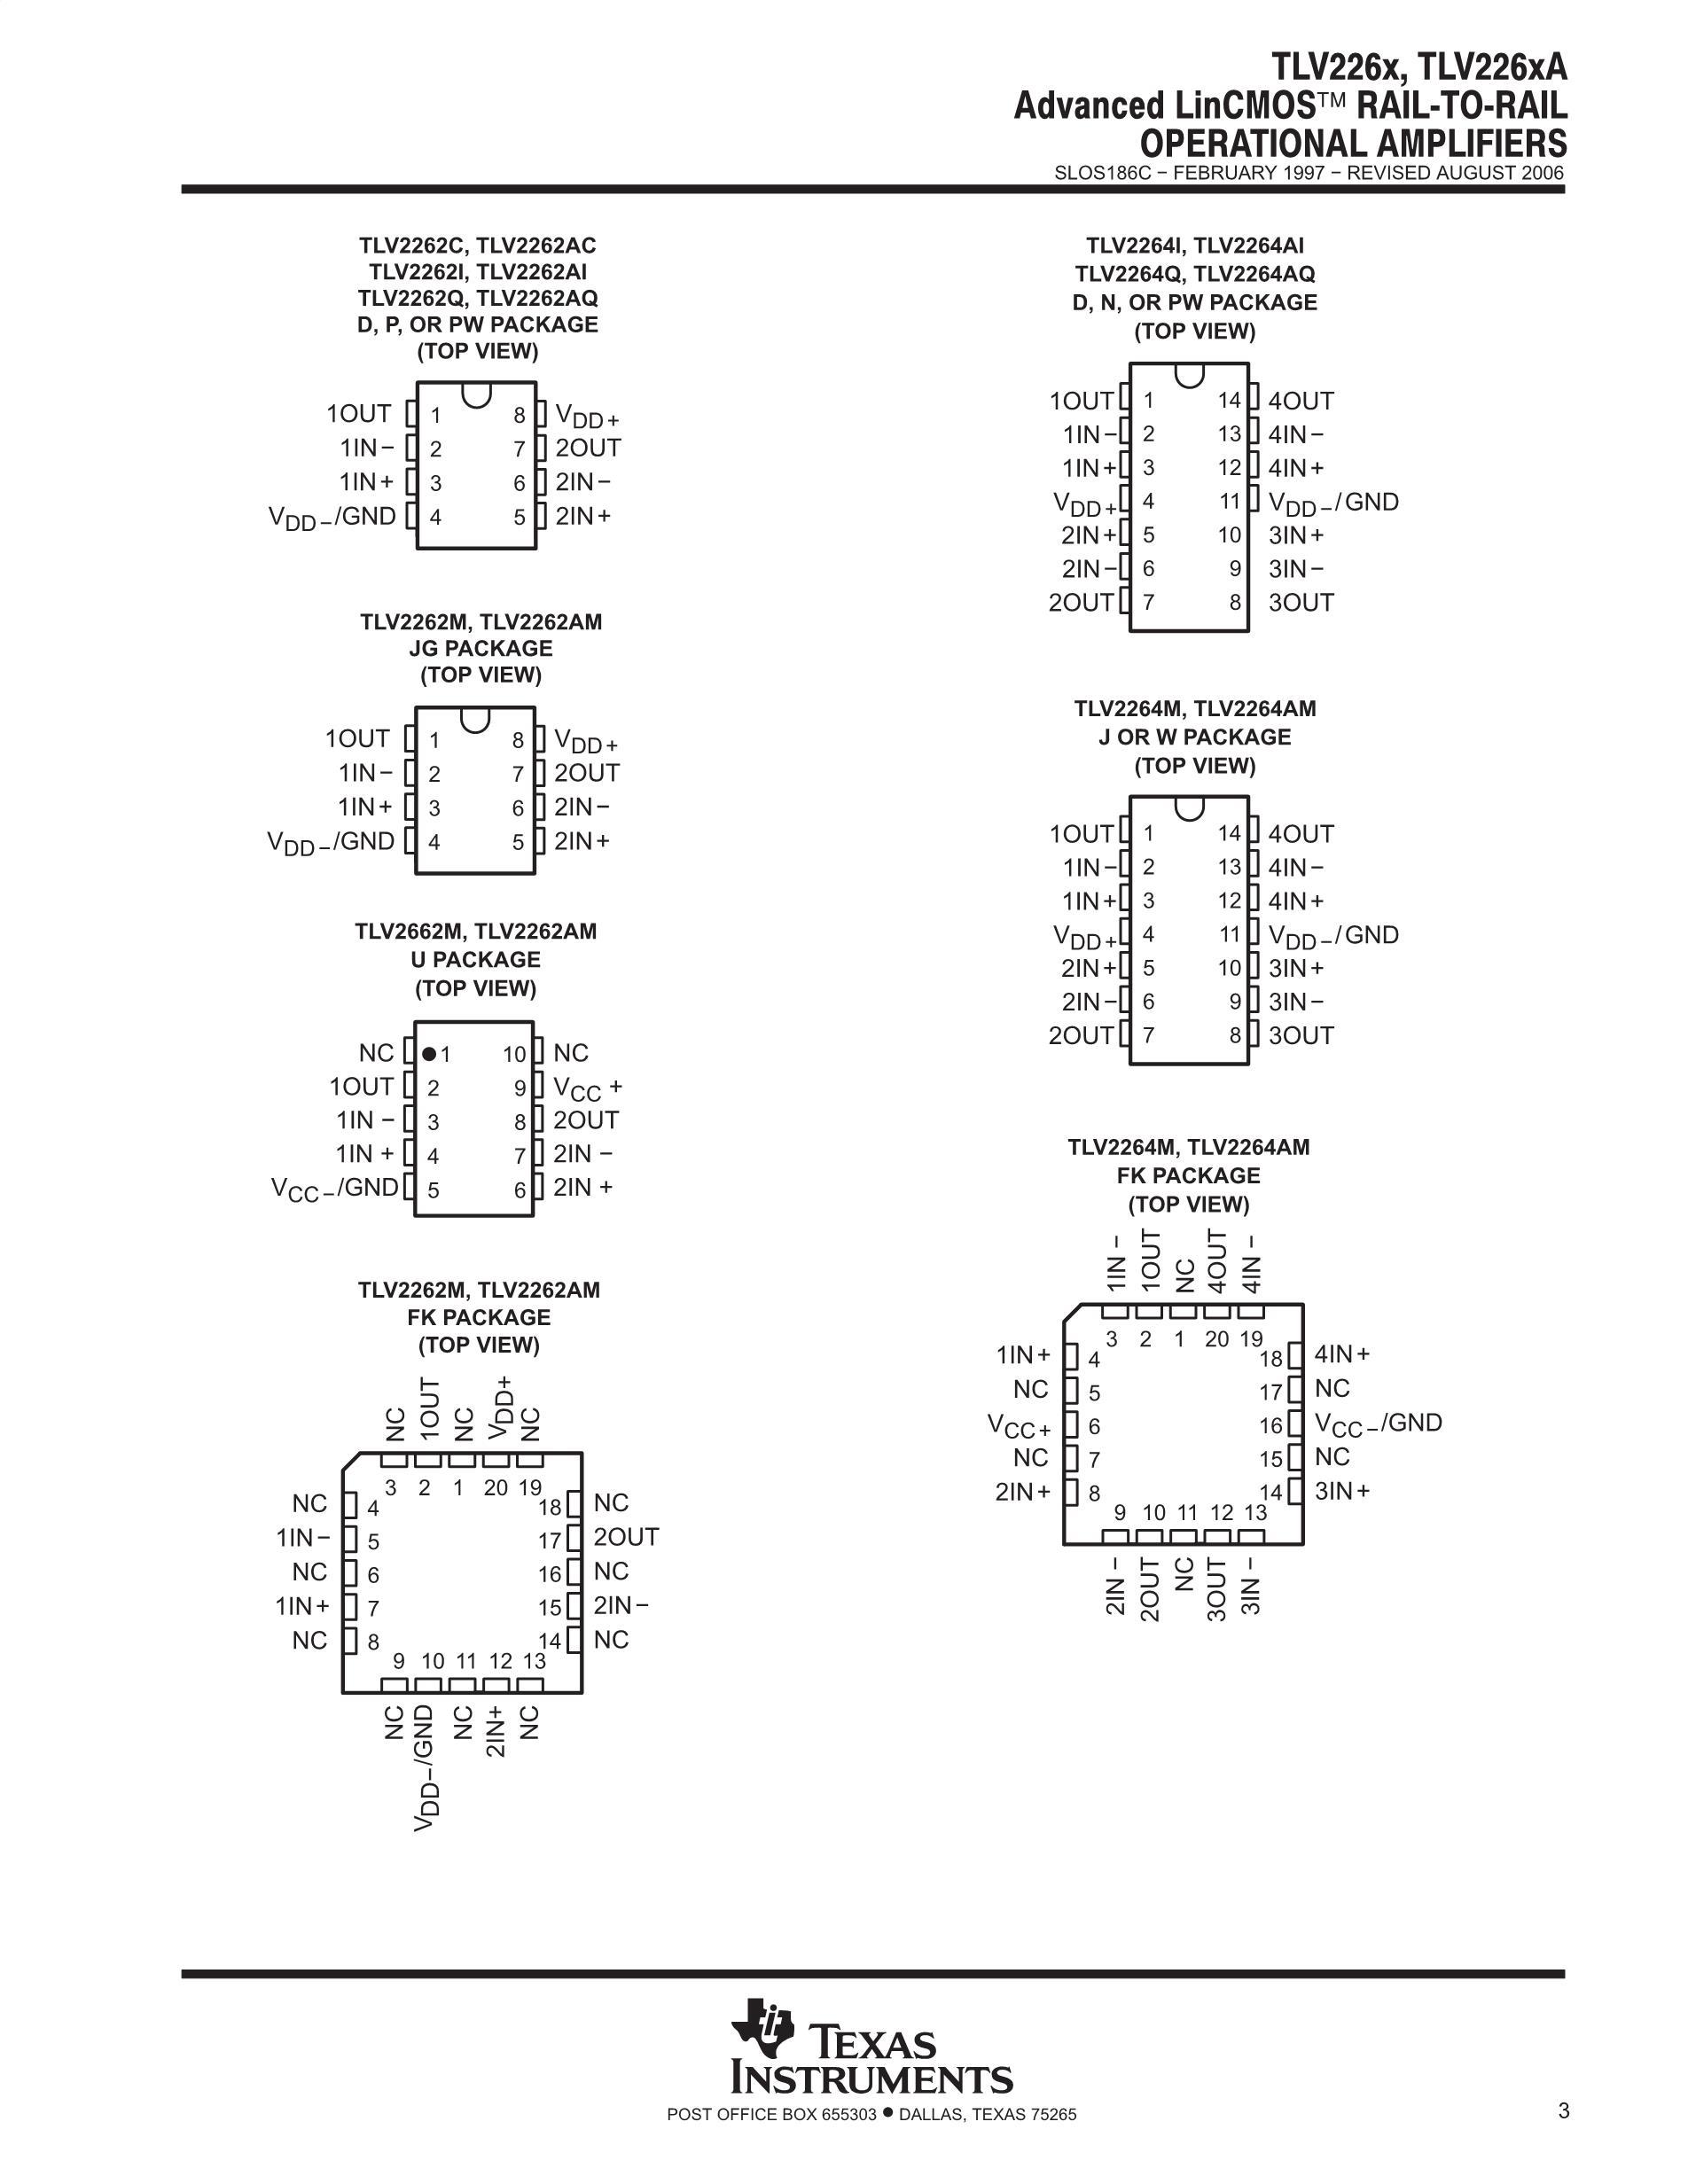 2262/2272 Four-way security accessories M4 non-lock receiving board feed remote control board wireless remote control's pdf picture 3